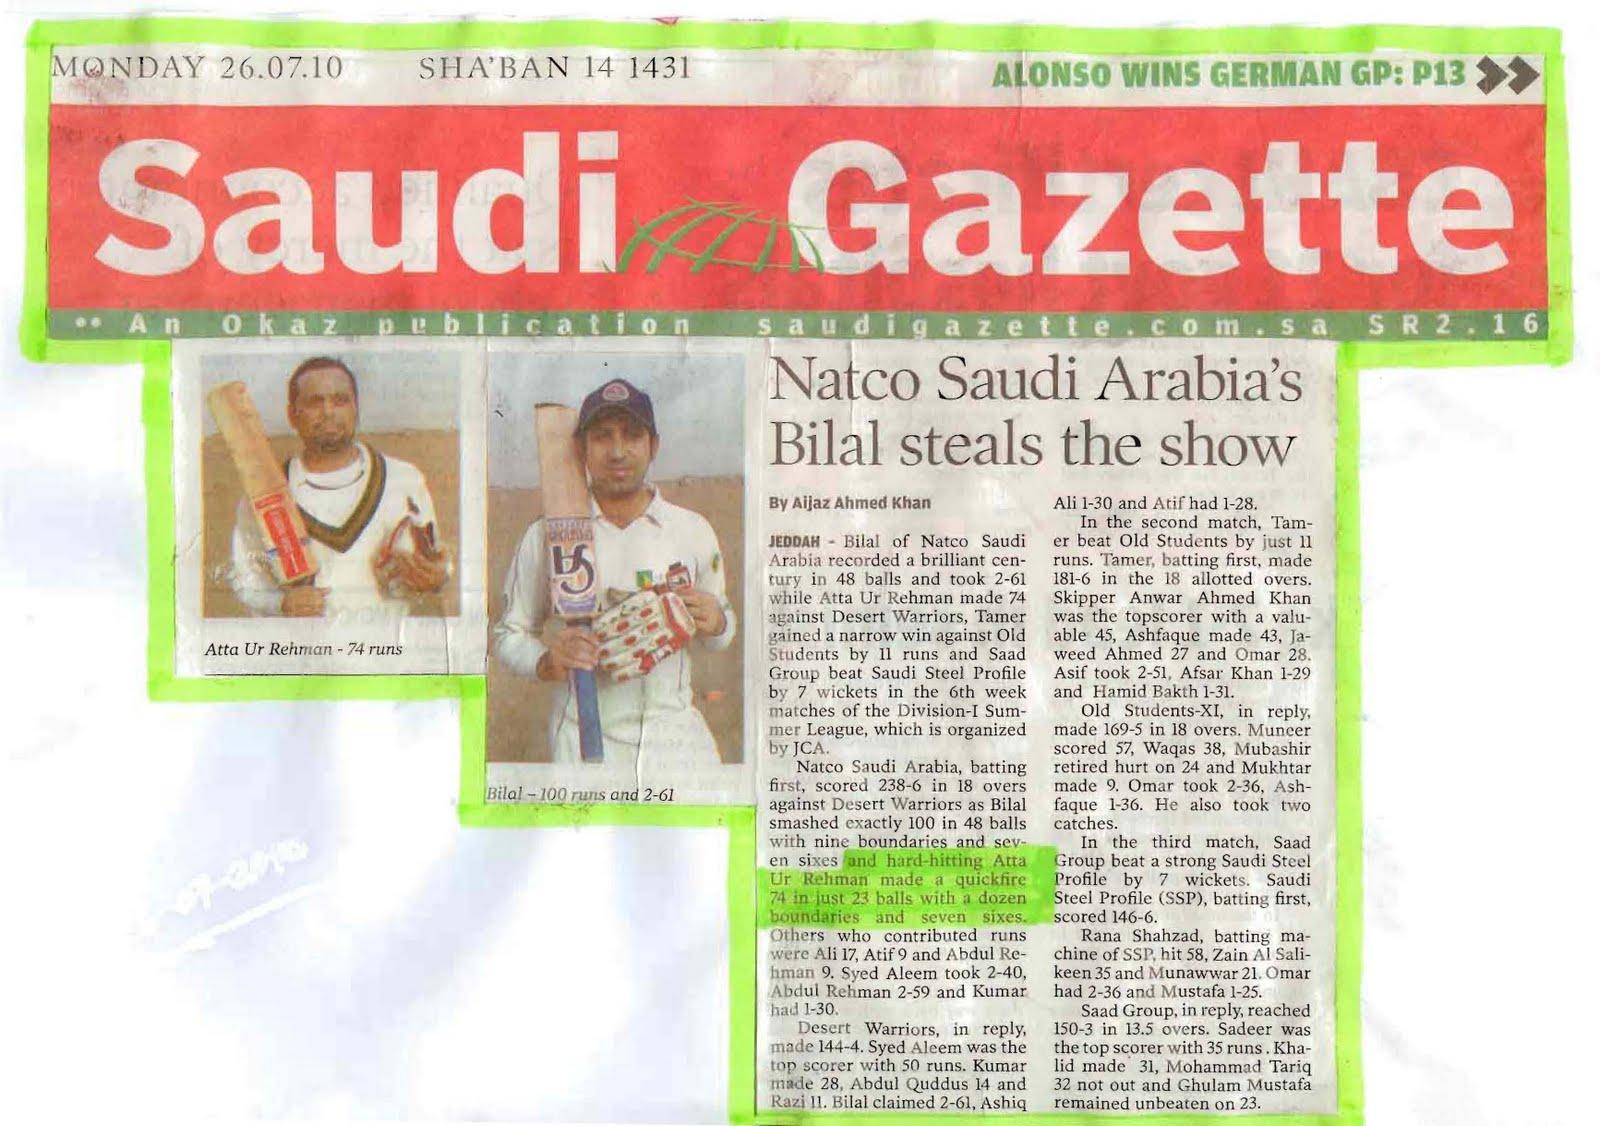 Atta Ur Rehman Mughal Player of Saudi Arabia